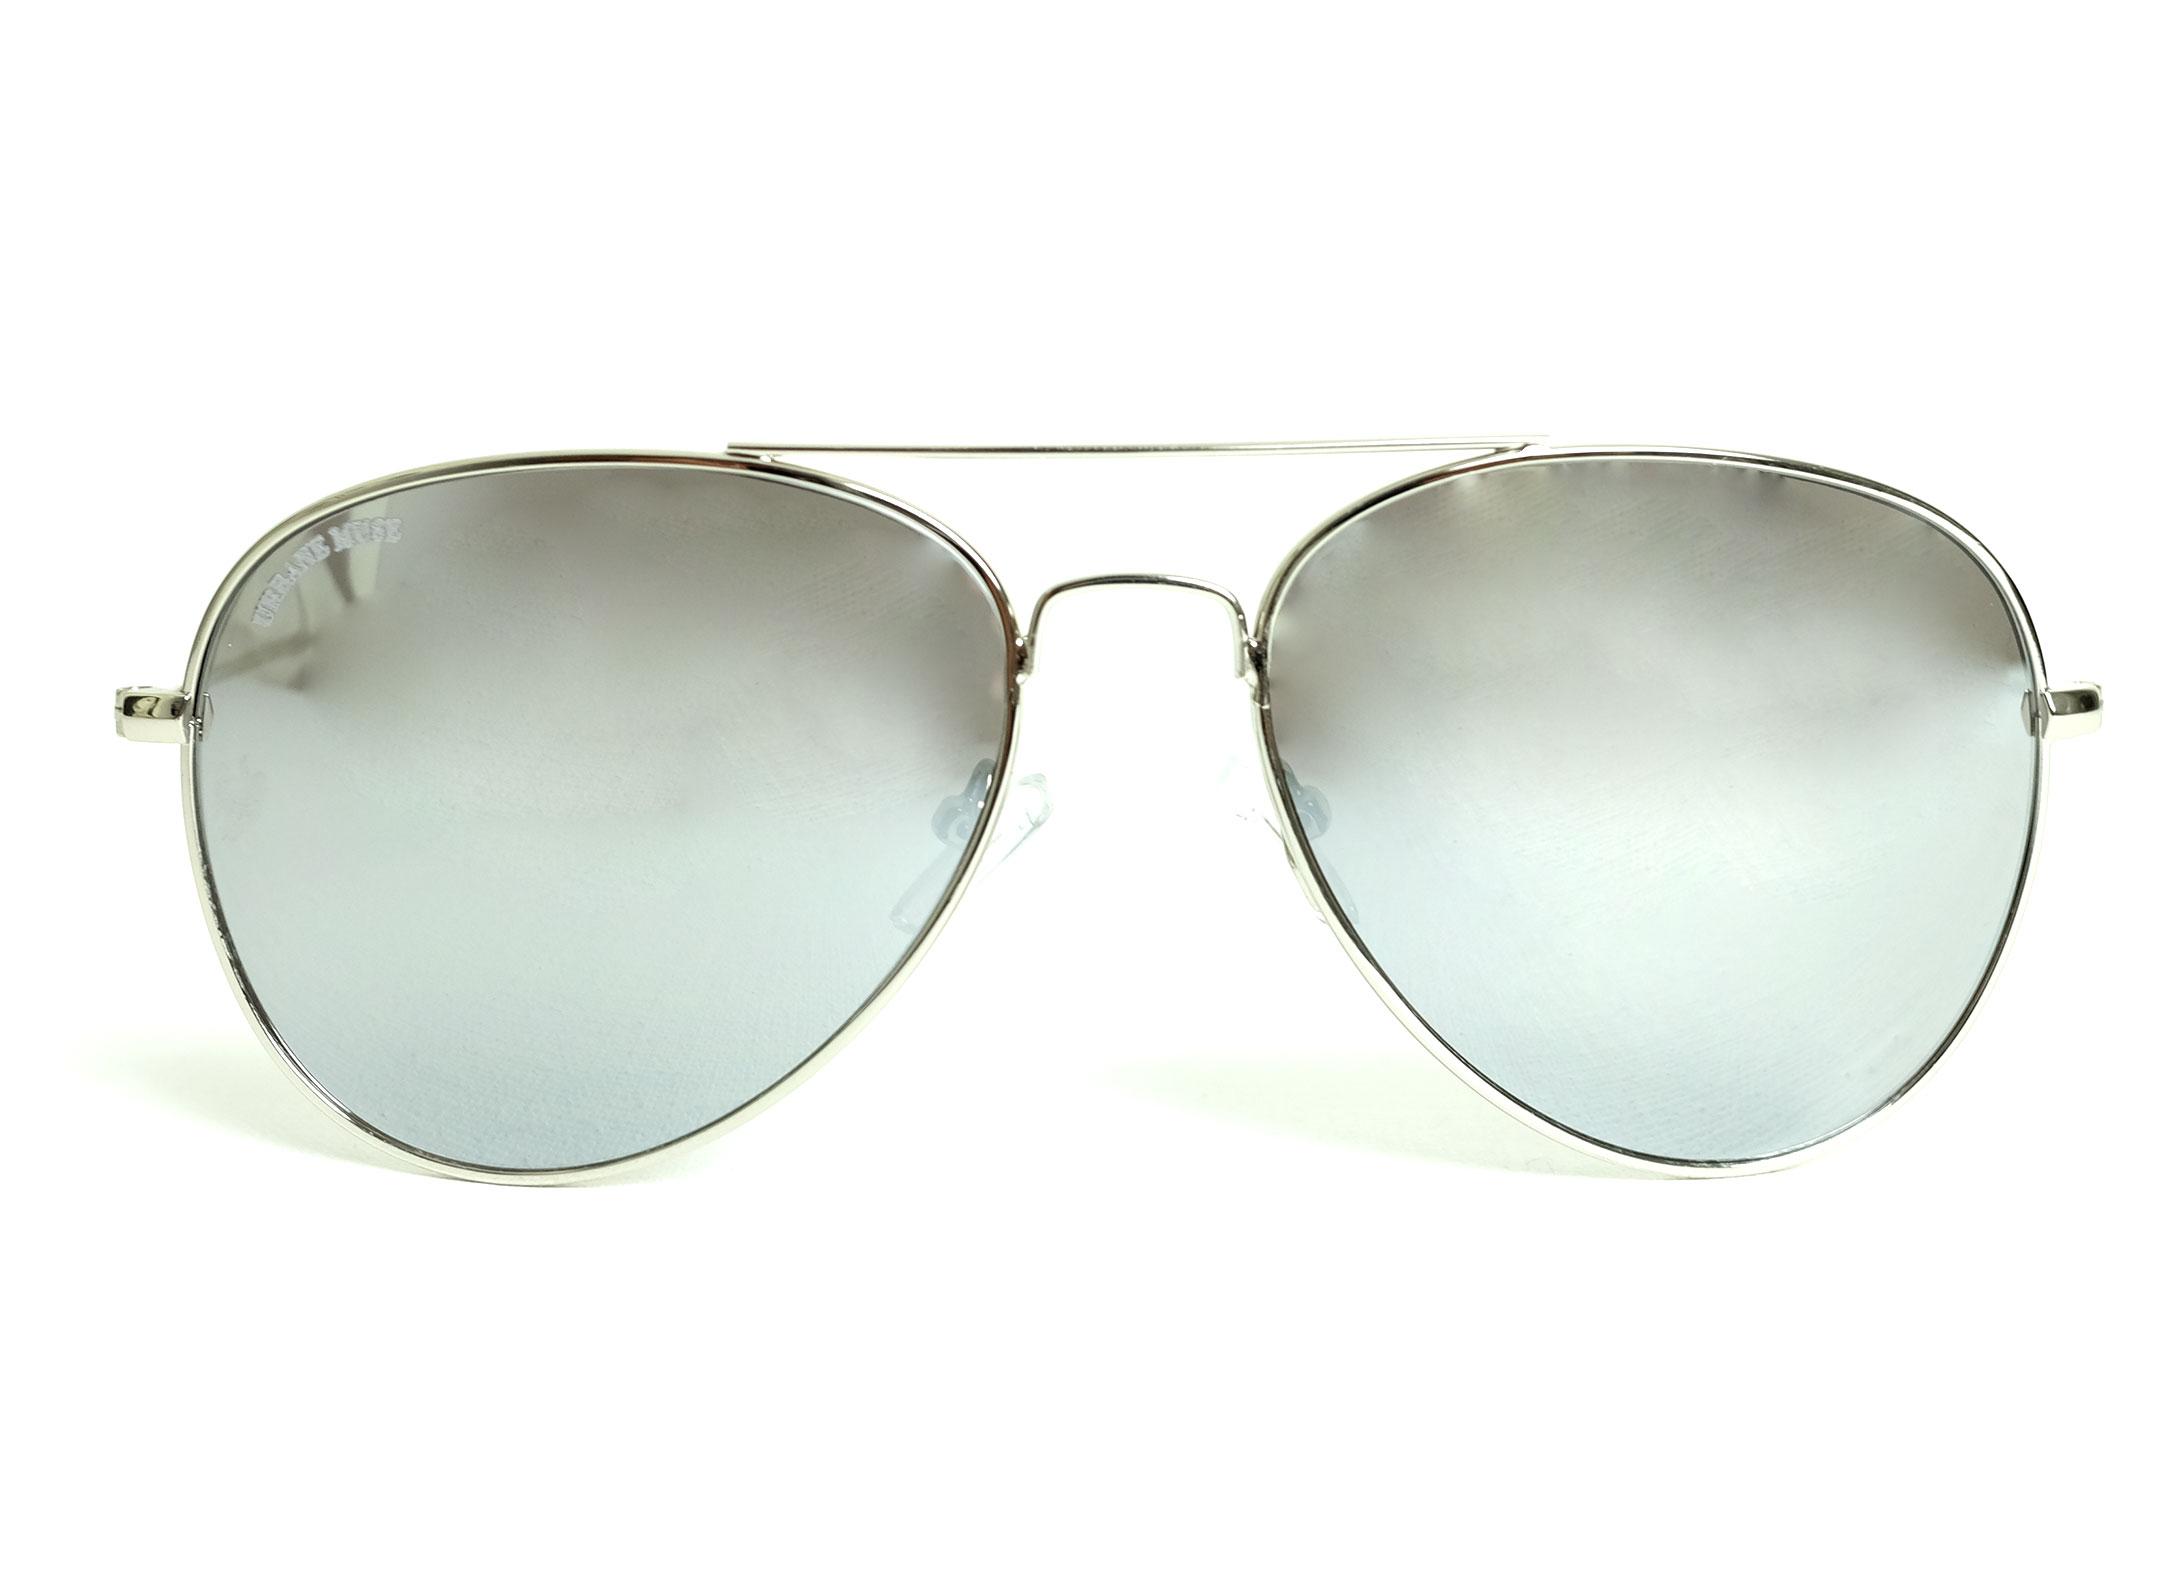 Sunglasses With Mirror Metal Silver Frame Lens Aviator f6bgyYI7v